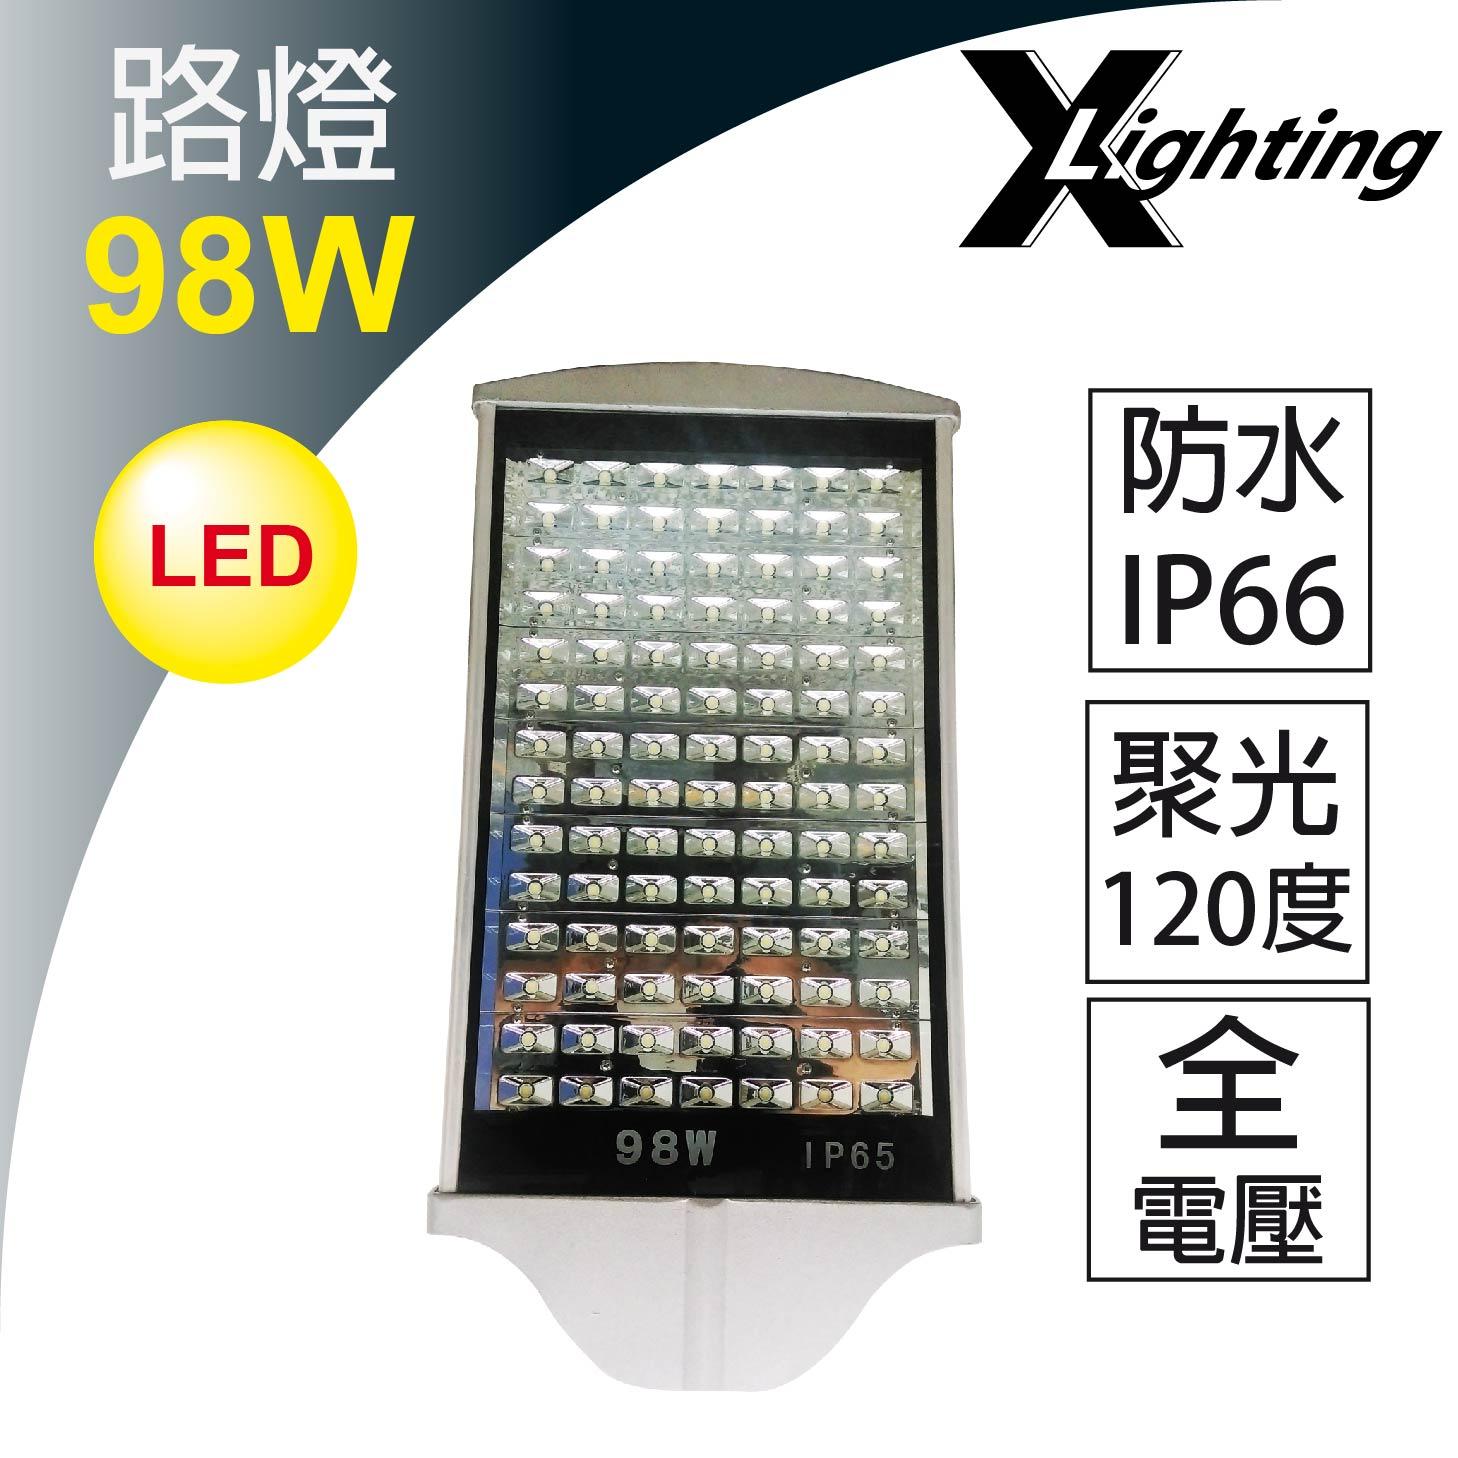 LED 路燈 98W 白光 防水3年保固 EXPC X-LIGHTING (50W 100W 150W )